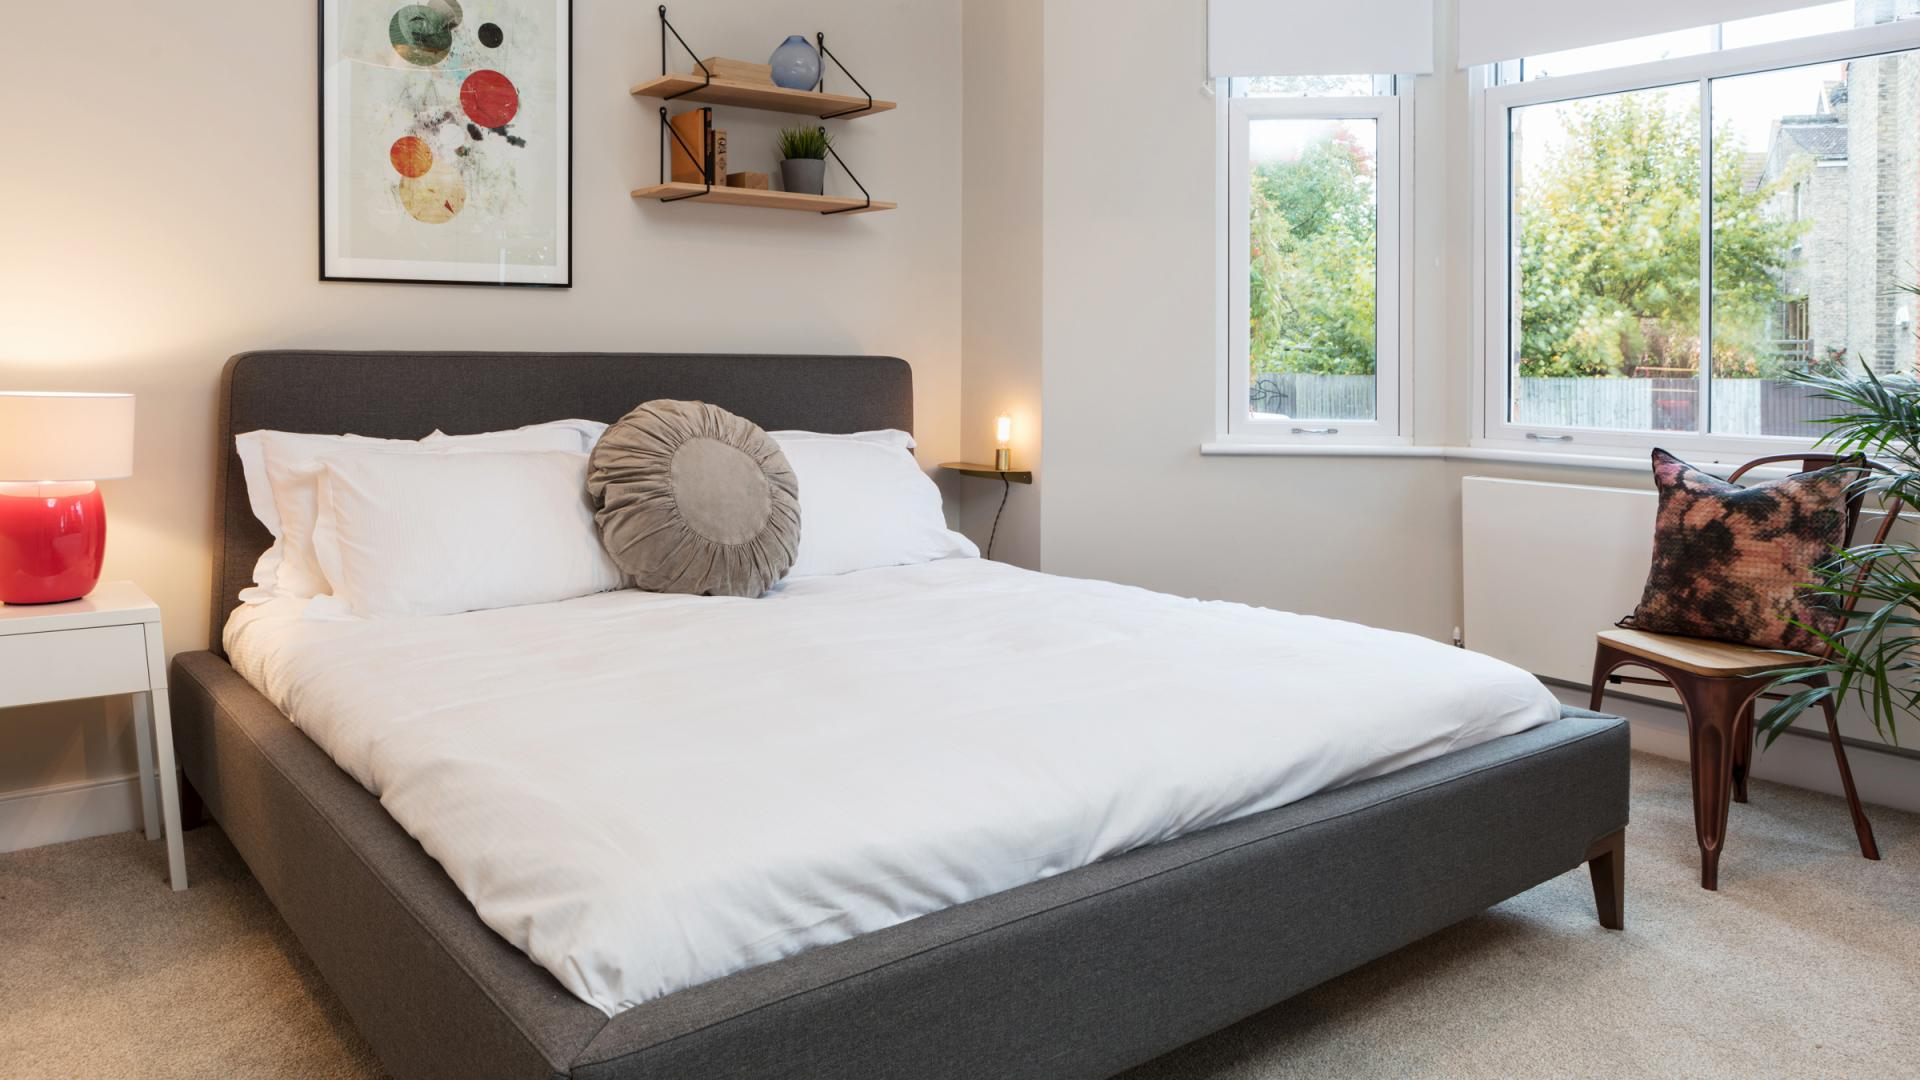 Bedroom at Byrne Garden 1 Apartment